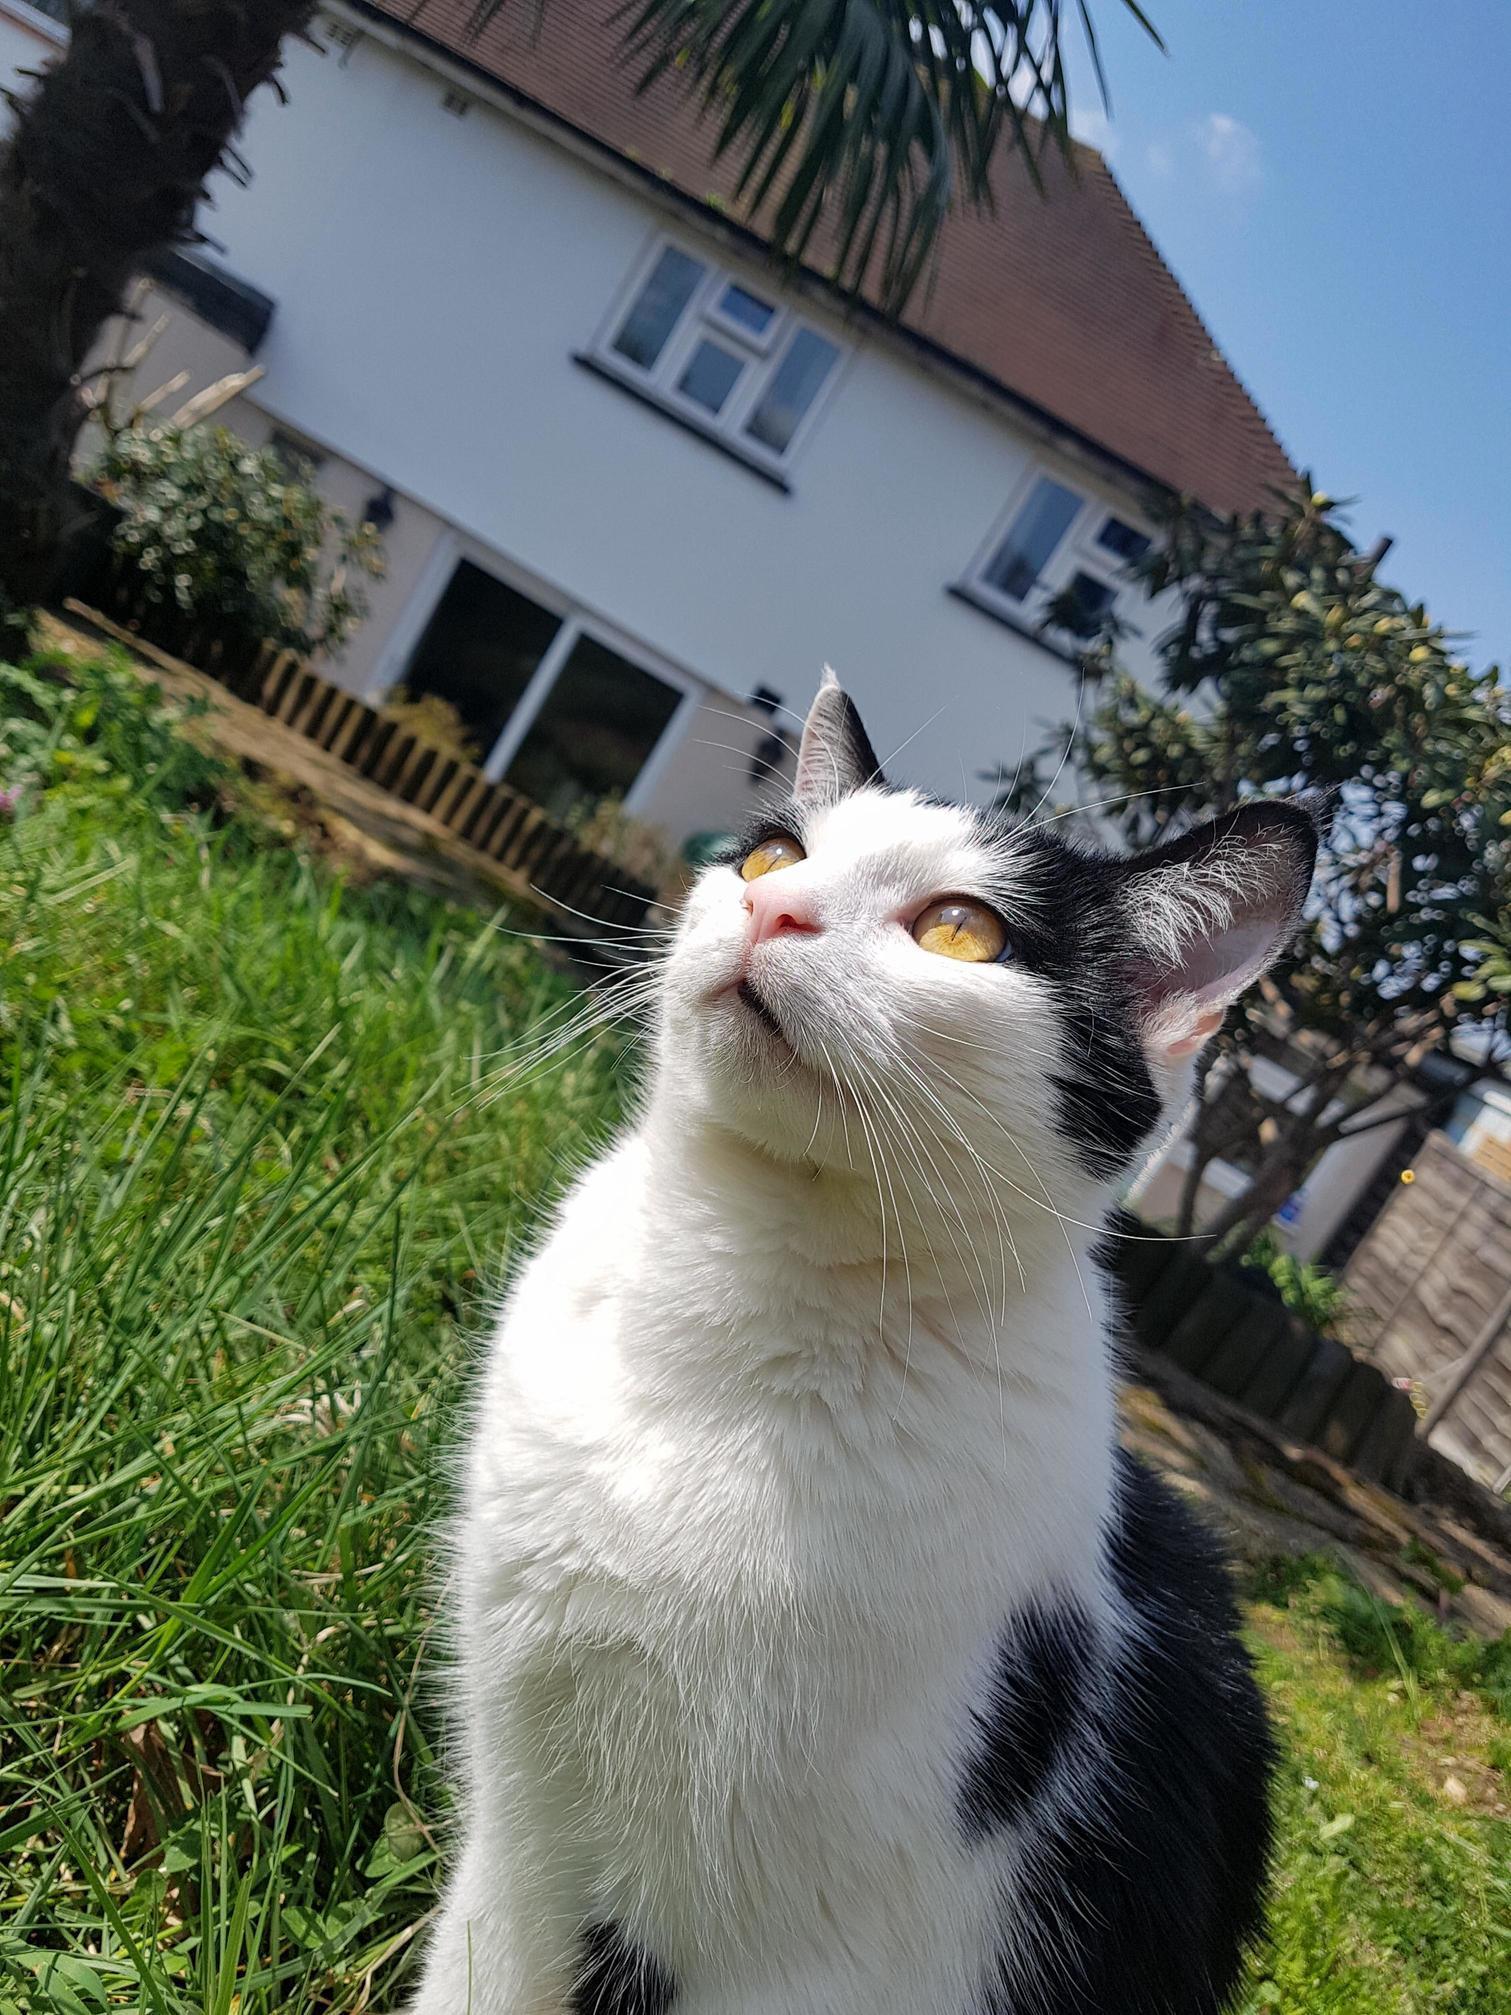 Mogwai looks adorable in the sun